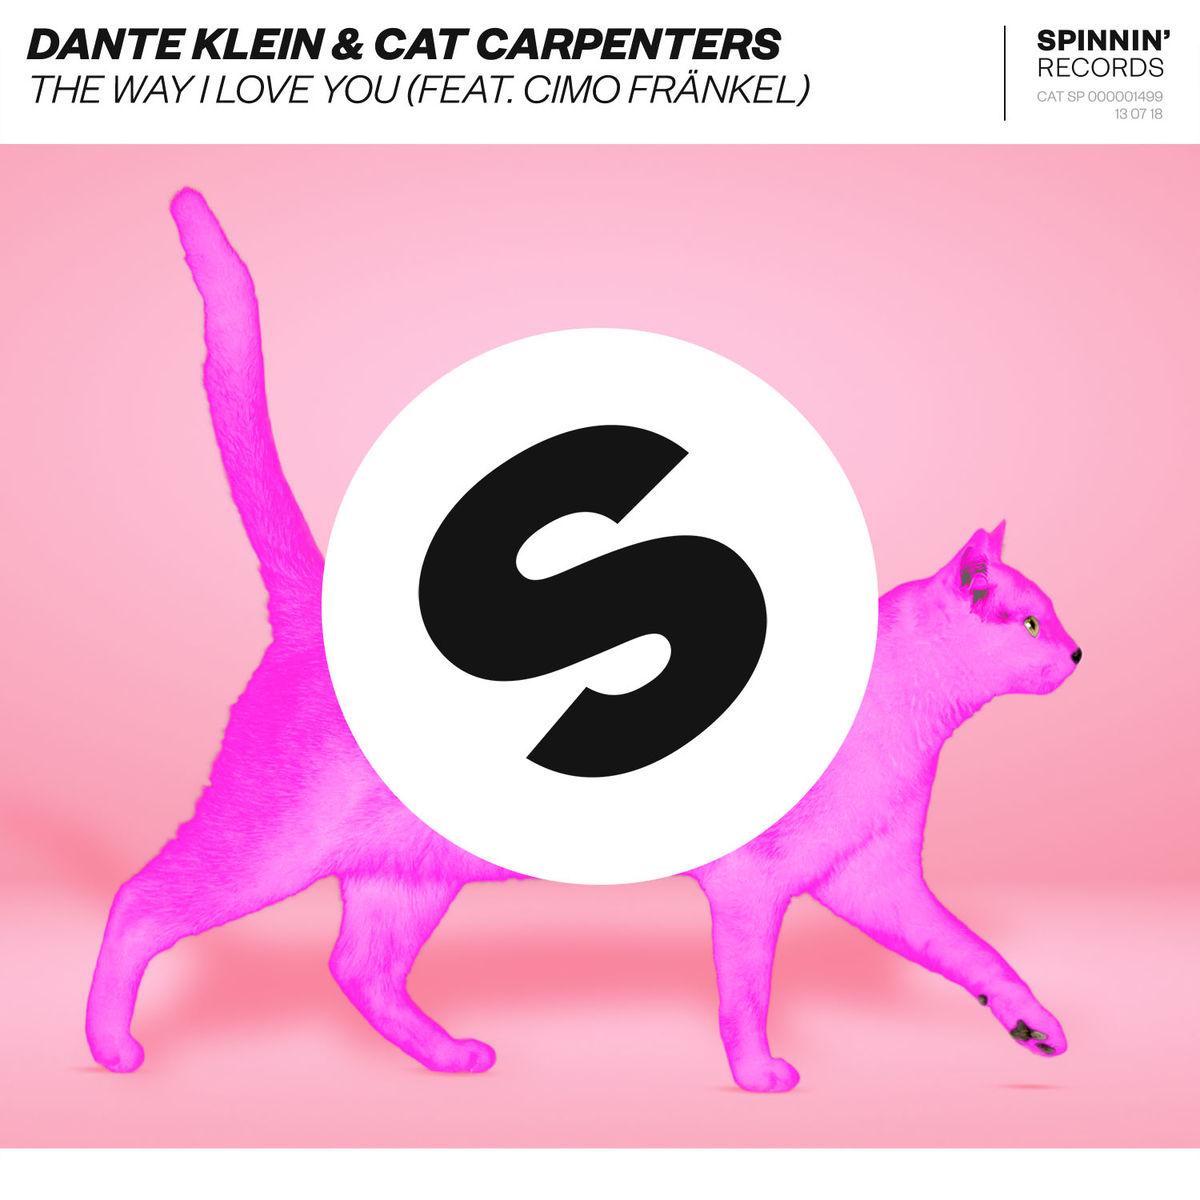 Ultratopbe Dante Klein Cat Carpenters Feat Cimo Fränkel The